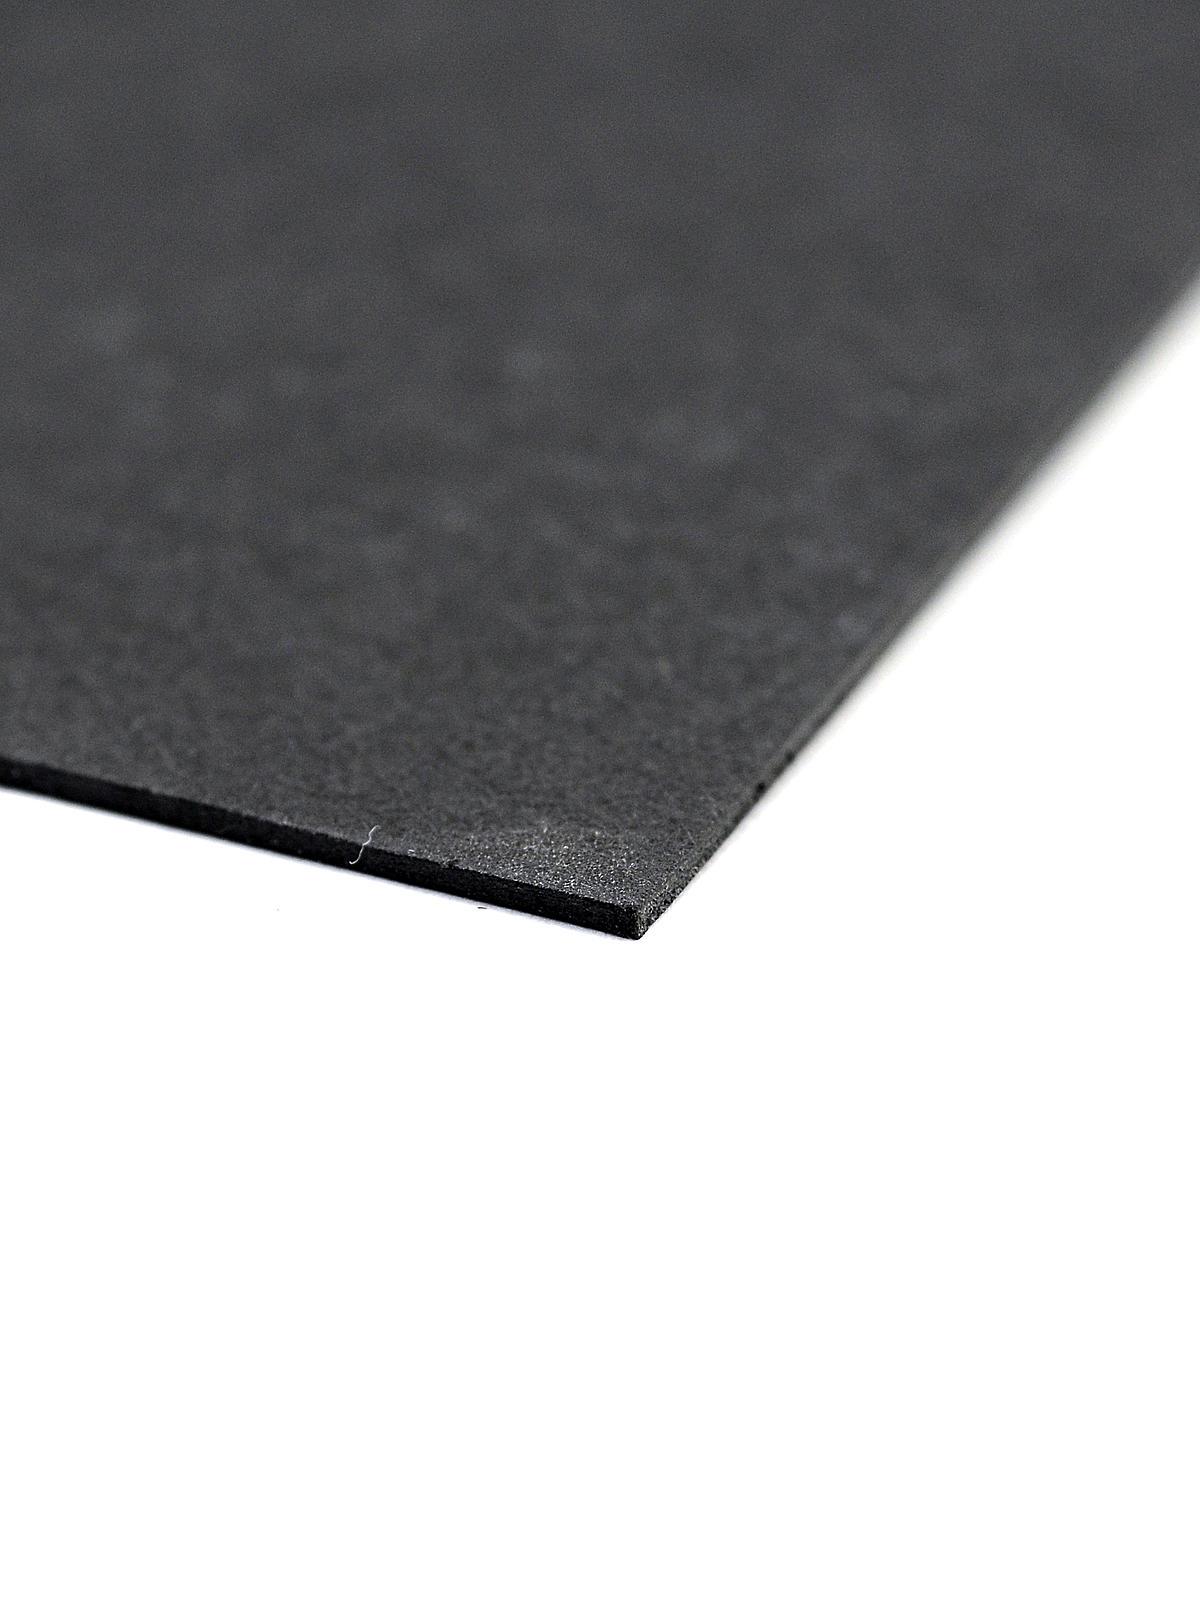 bainbridge archival mats quality museum group mat board